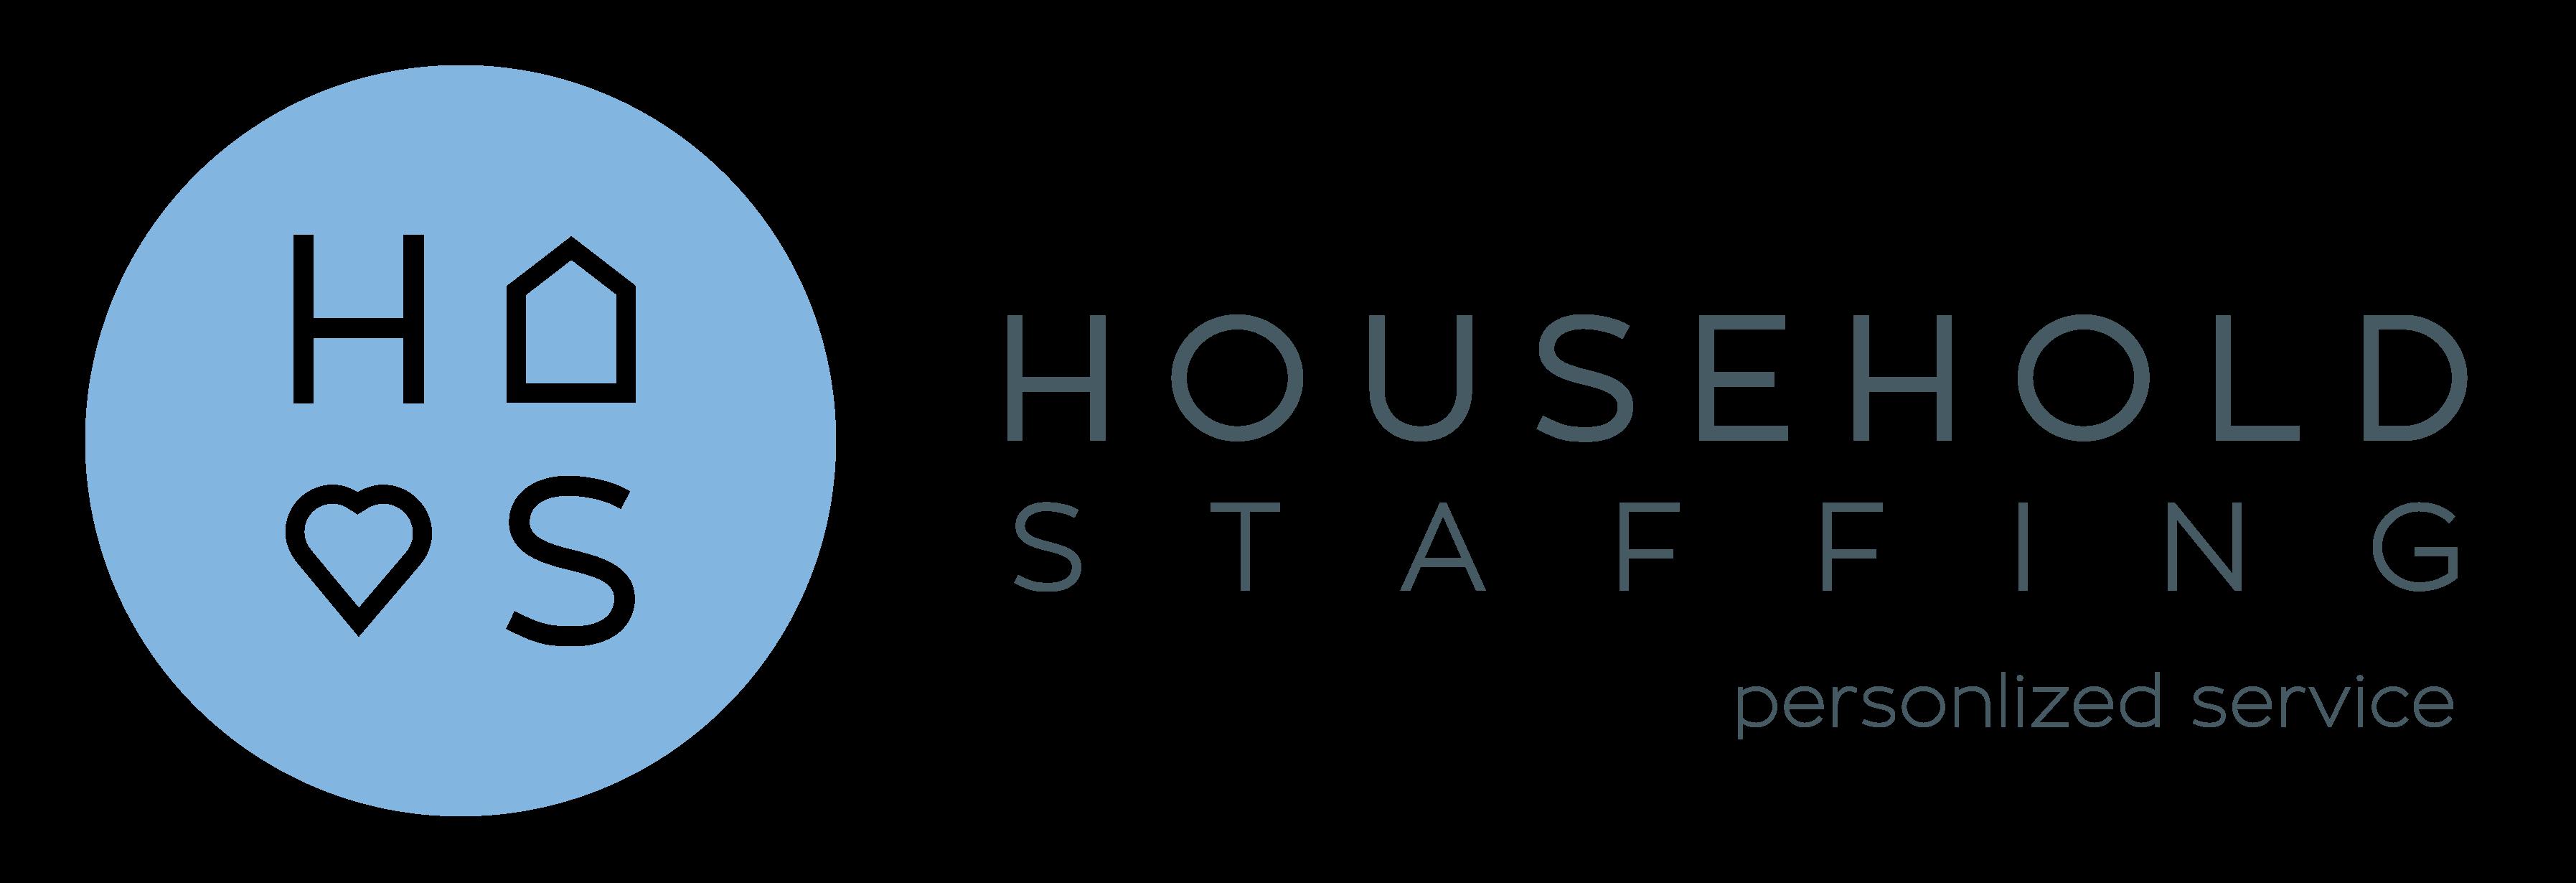 hs-logo-alt-tagline-trans